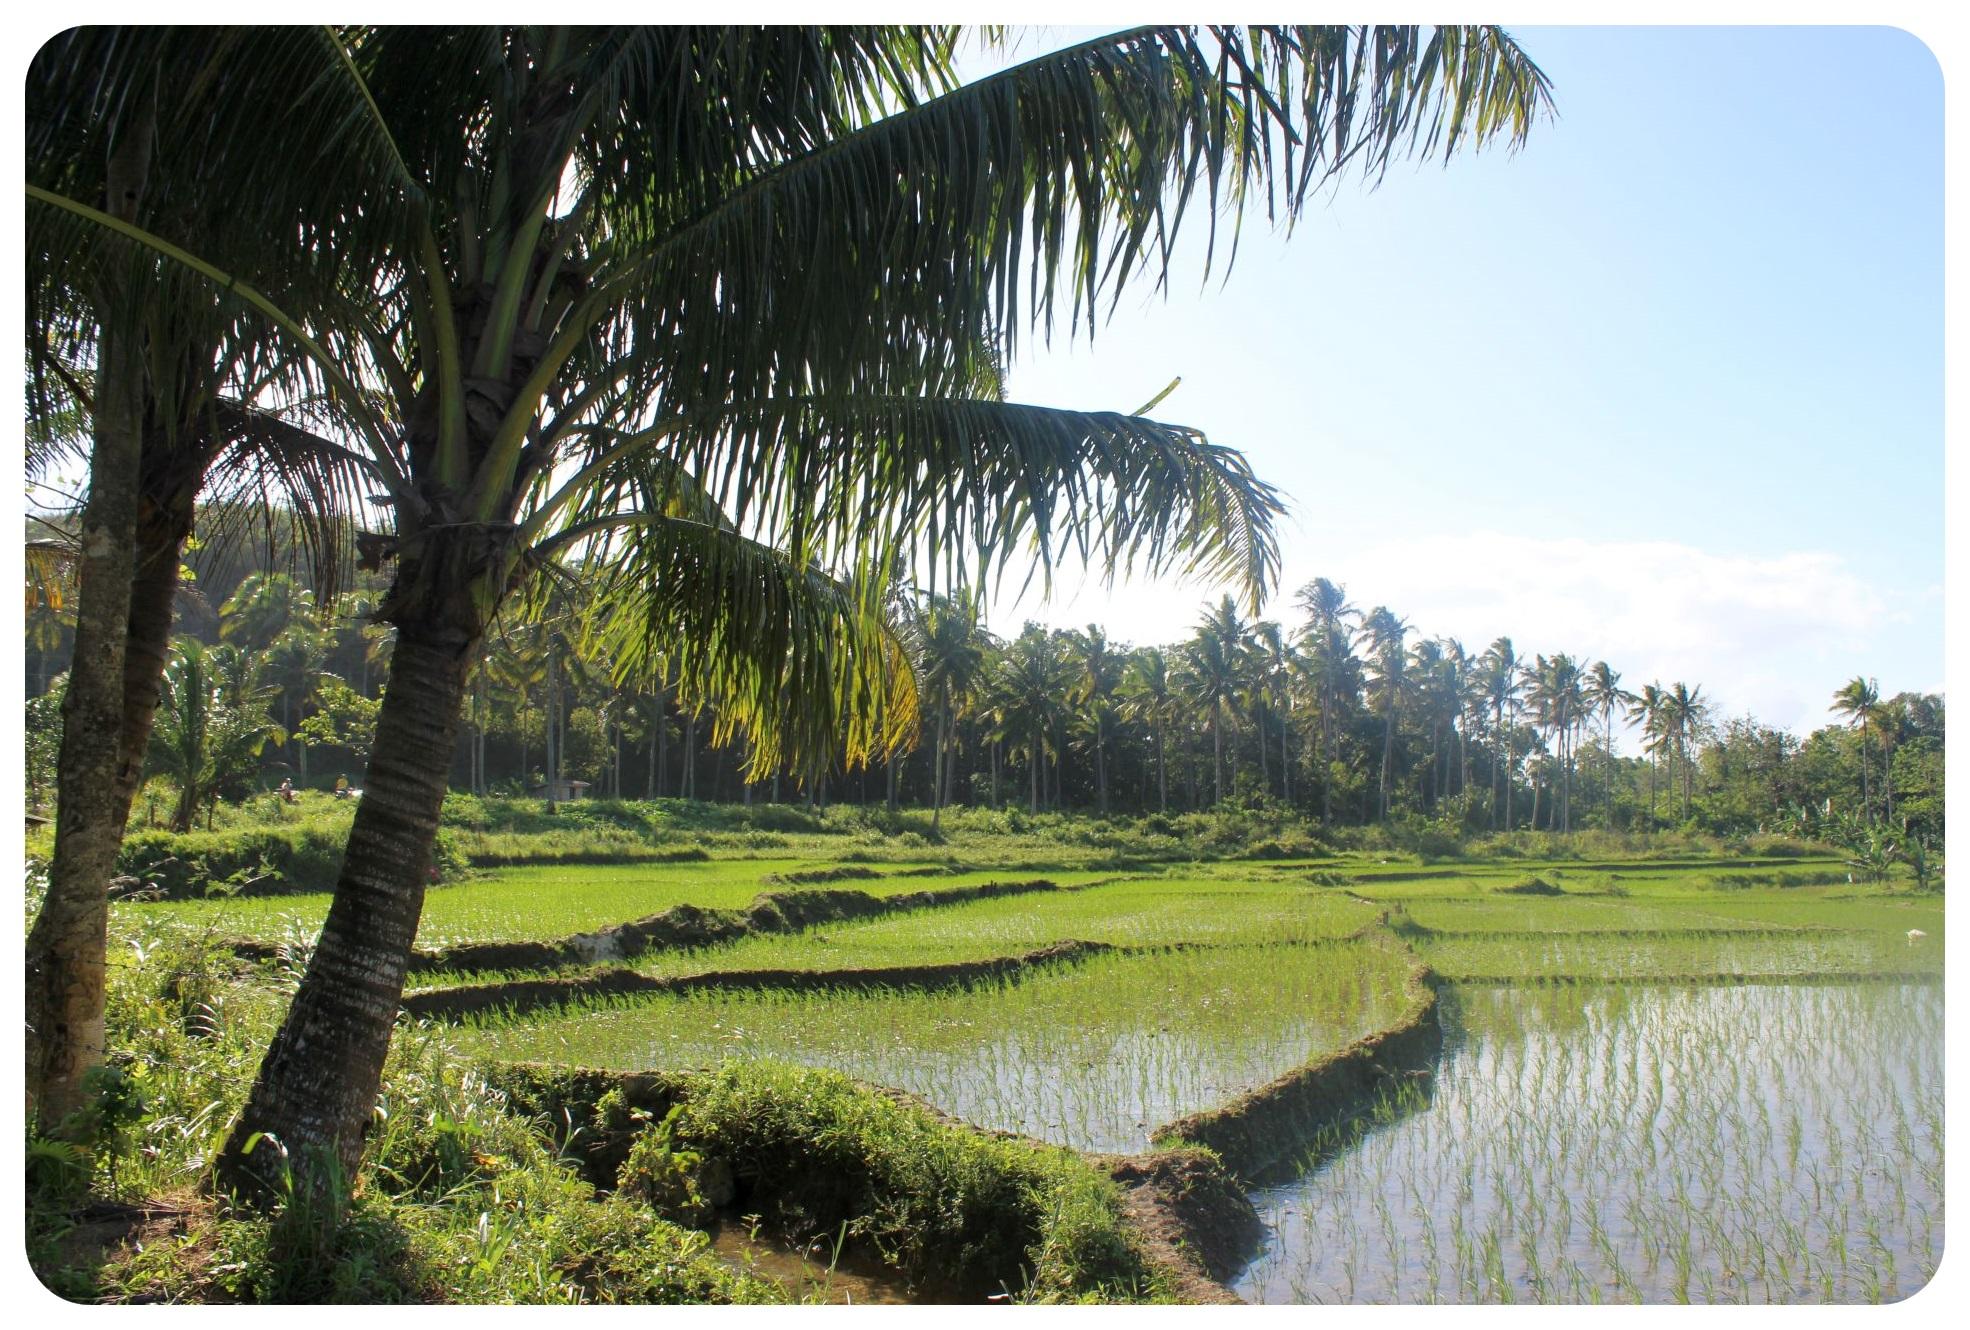 bohol rice fields philippines